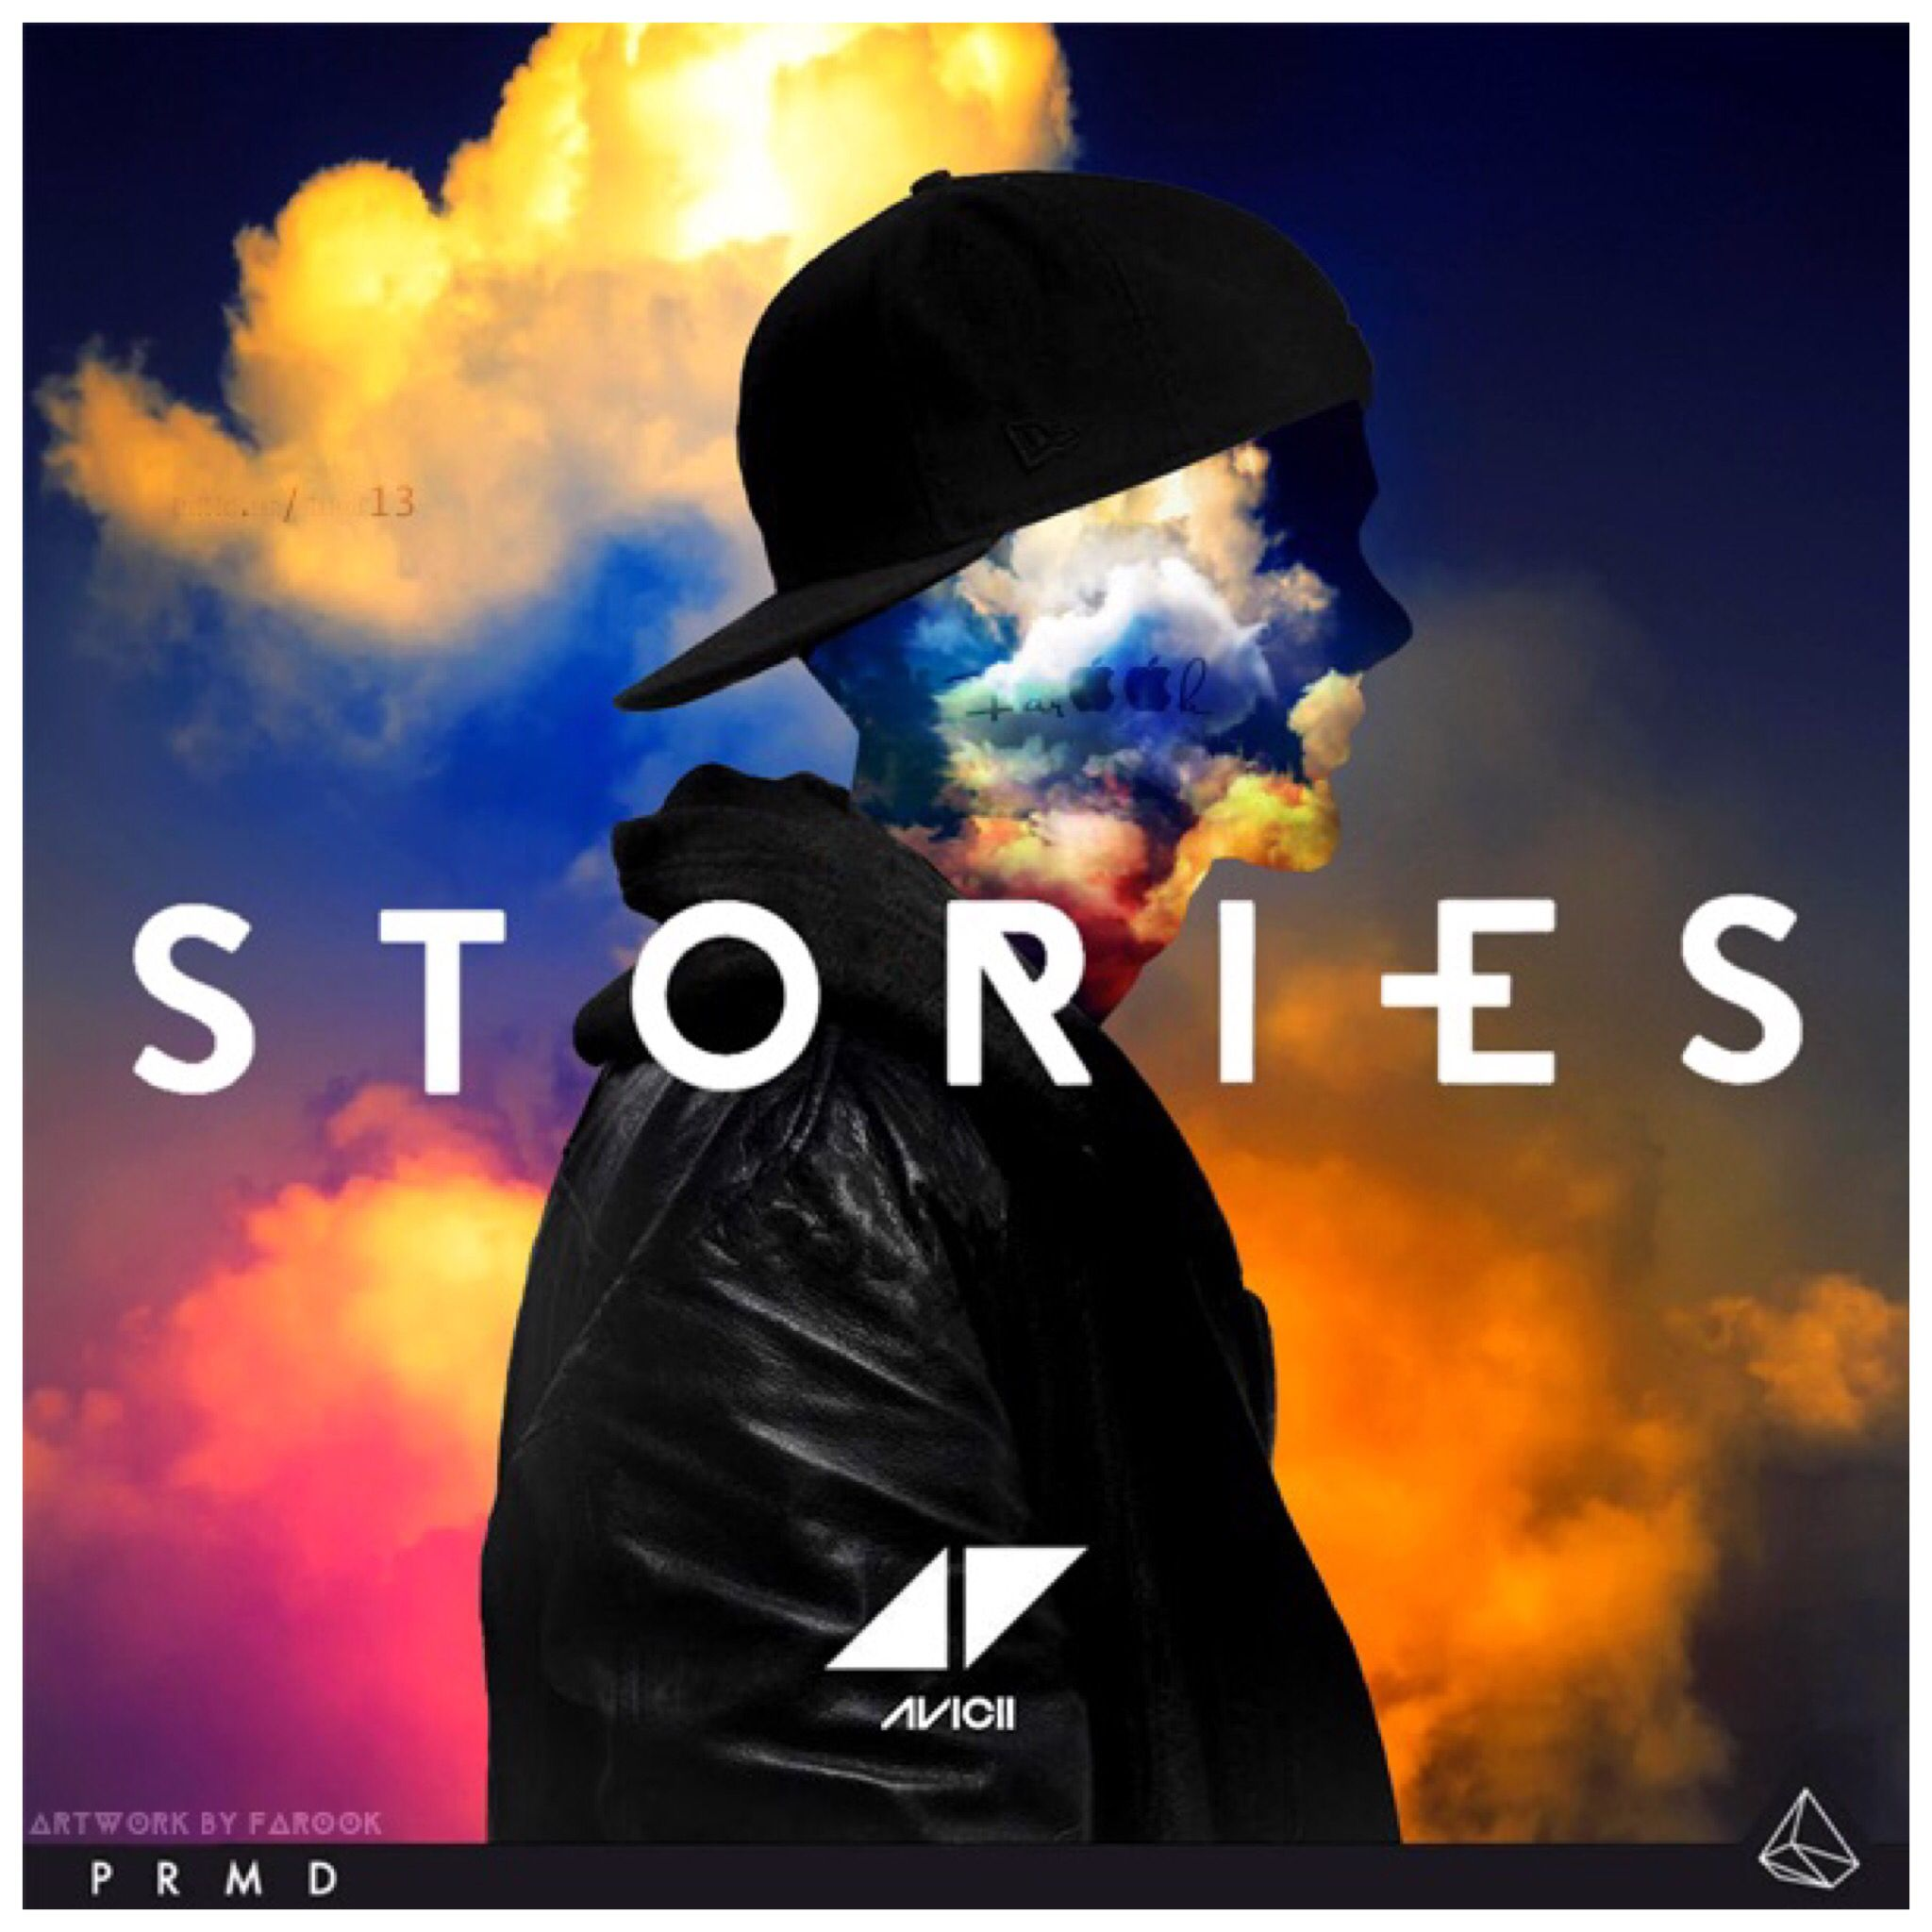 These are the days we've been waiting for... #TimBergling #Avicii #AlbumArt #Artwork #Stories by #FarookBaig #Design #photooftheday #TheDays #TheNights #AddictedToYou #WakeMeUp #HeyBrother #music #dance #edm #dj #upcomingalbum #FIFA15